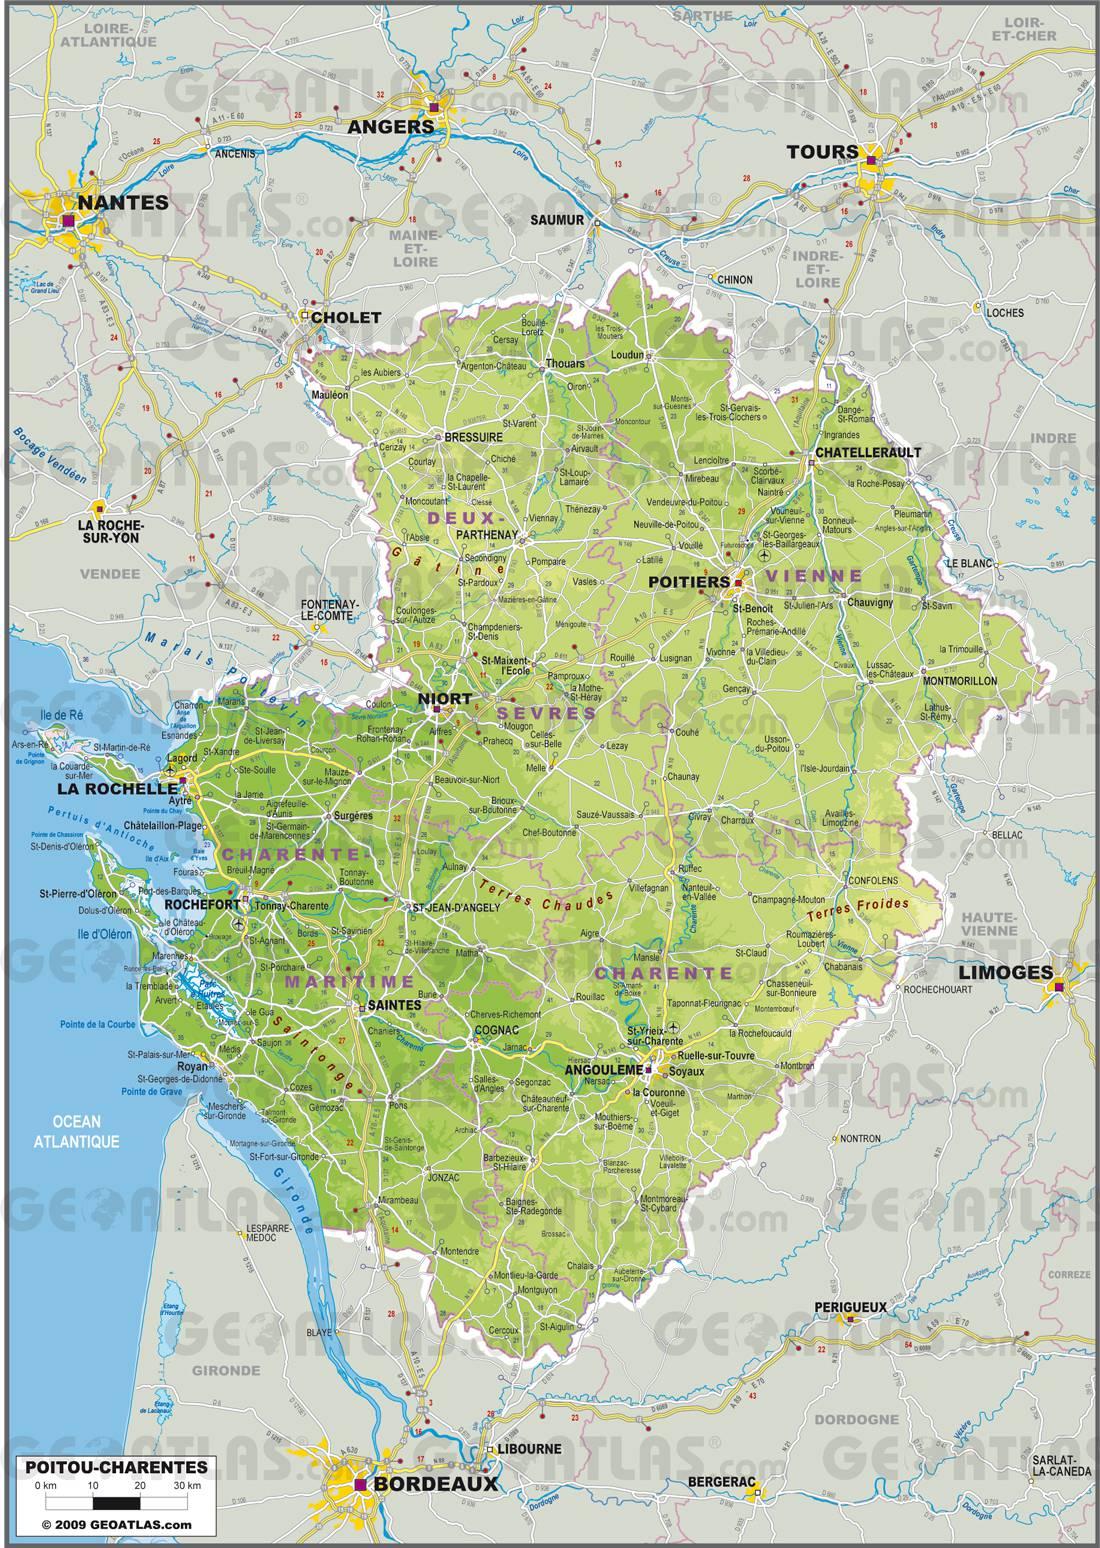 Poitou-Charentes carte